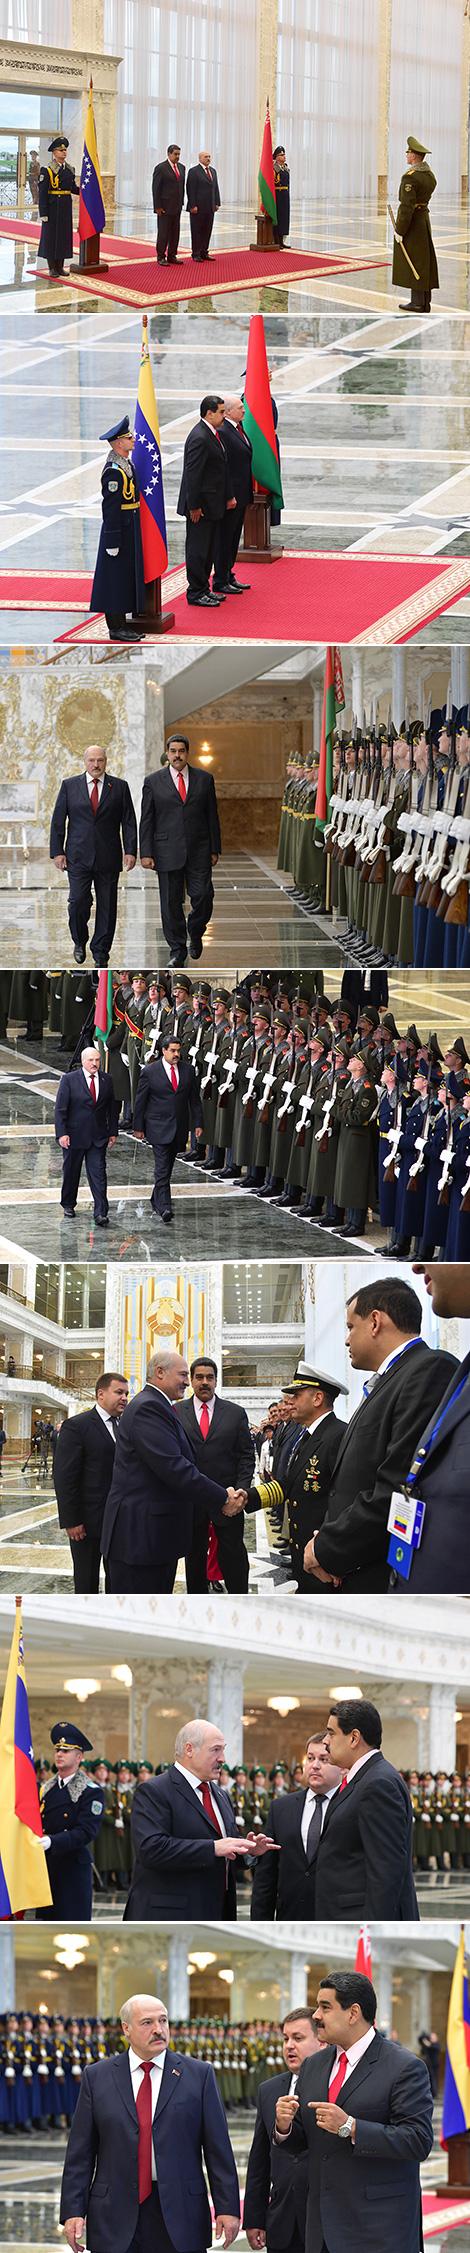 Церемония официальной встречи Президента Венесуэлы Николаса Мадуро во Дворце Независимости